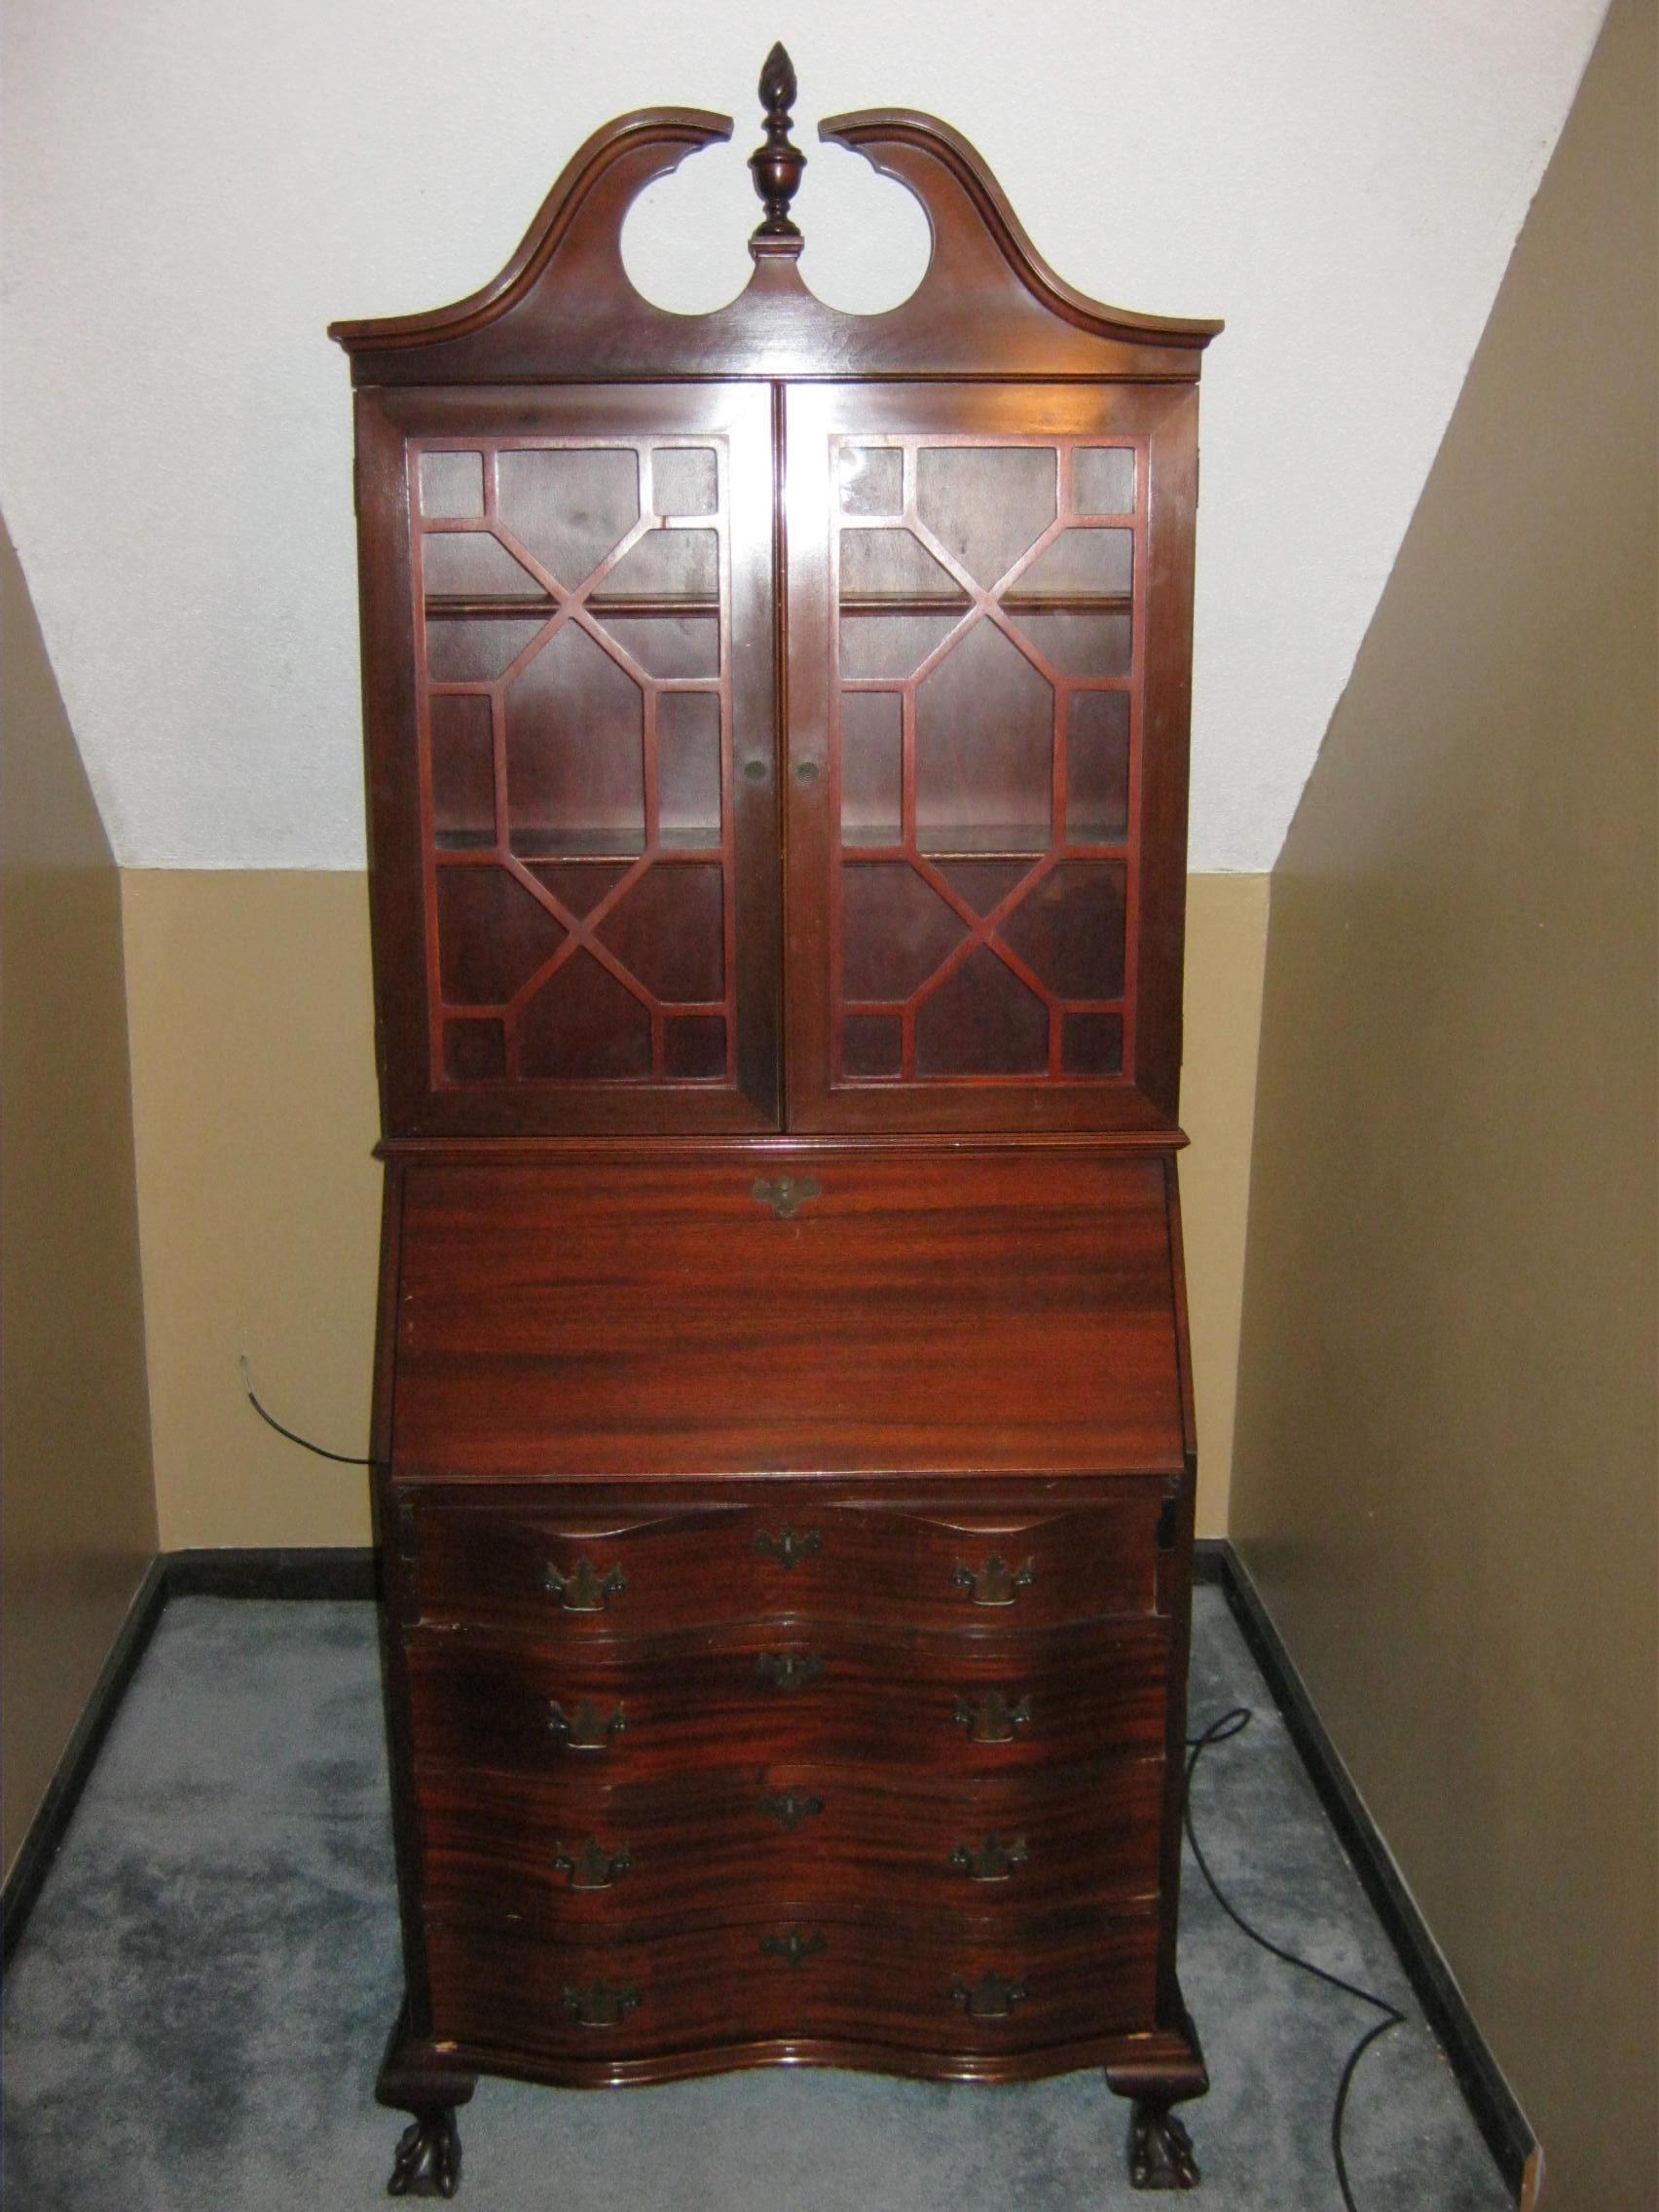 Charmant Antique Secretary Cabinet With Drop Down Desk For Sale